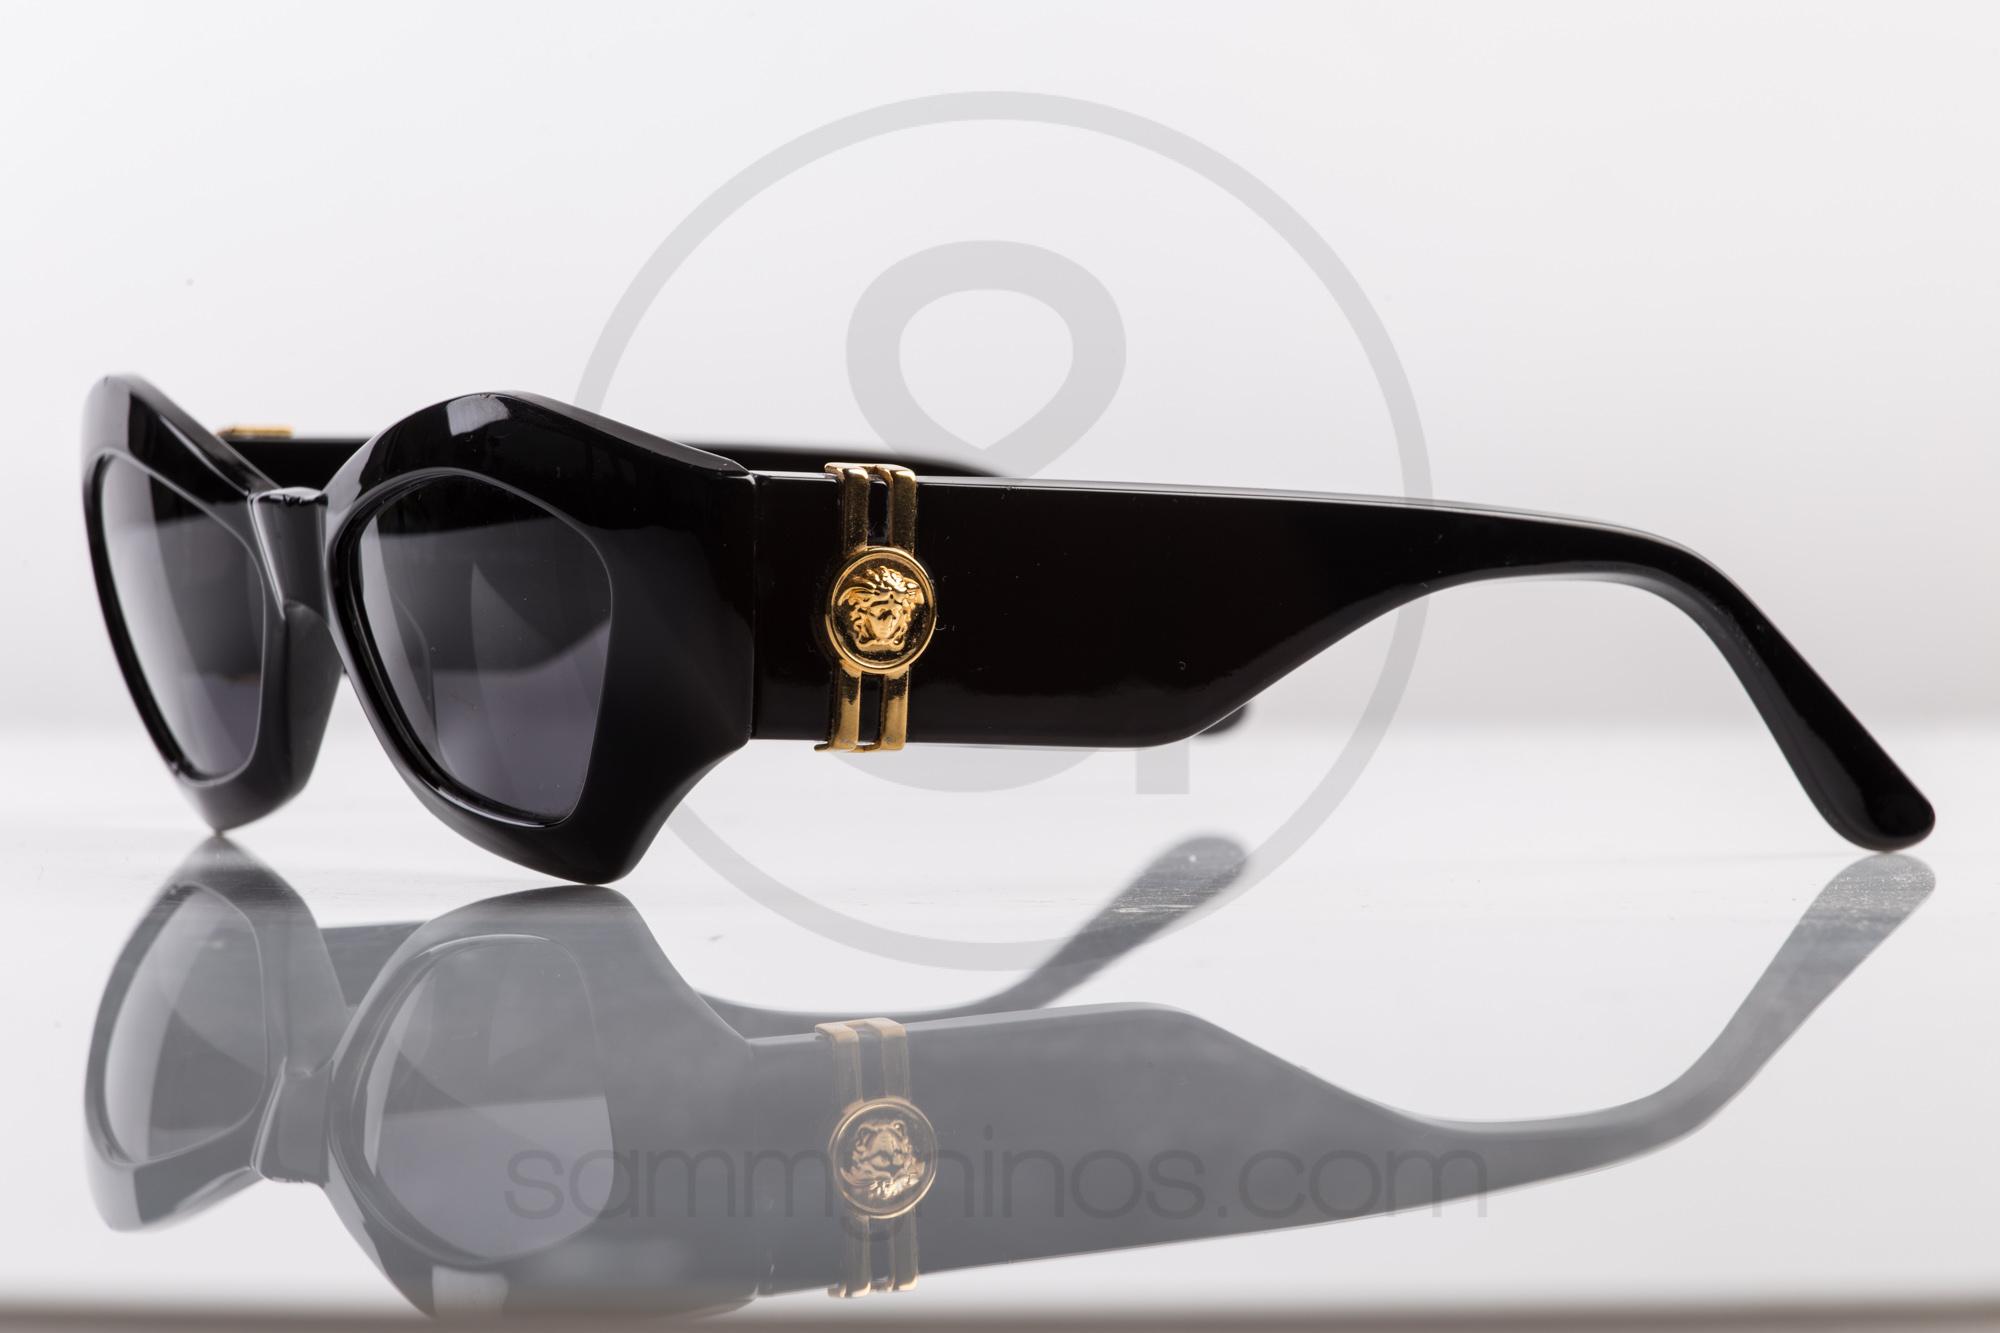 Gianni Versace 421/a 852 – Sammy & Nino\'s Store